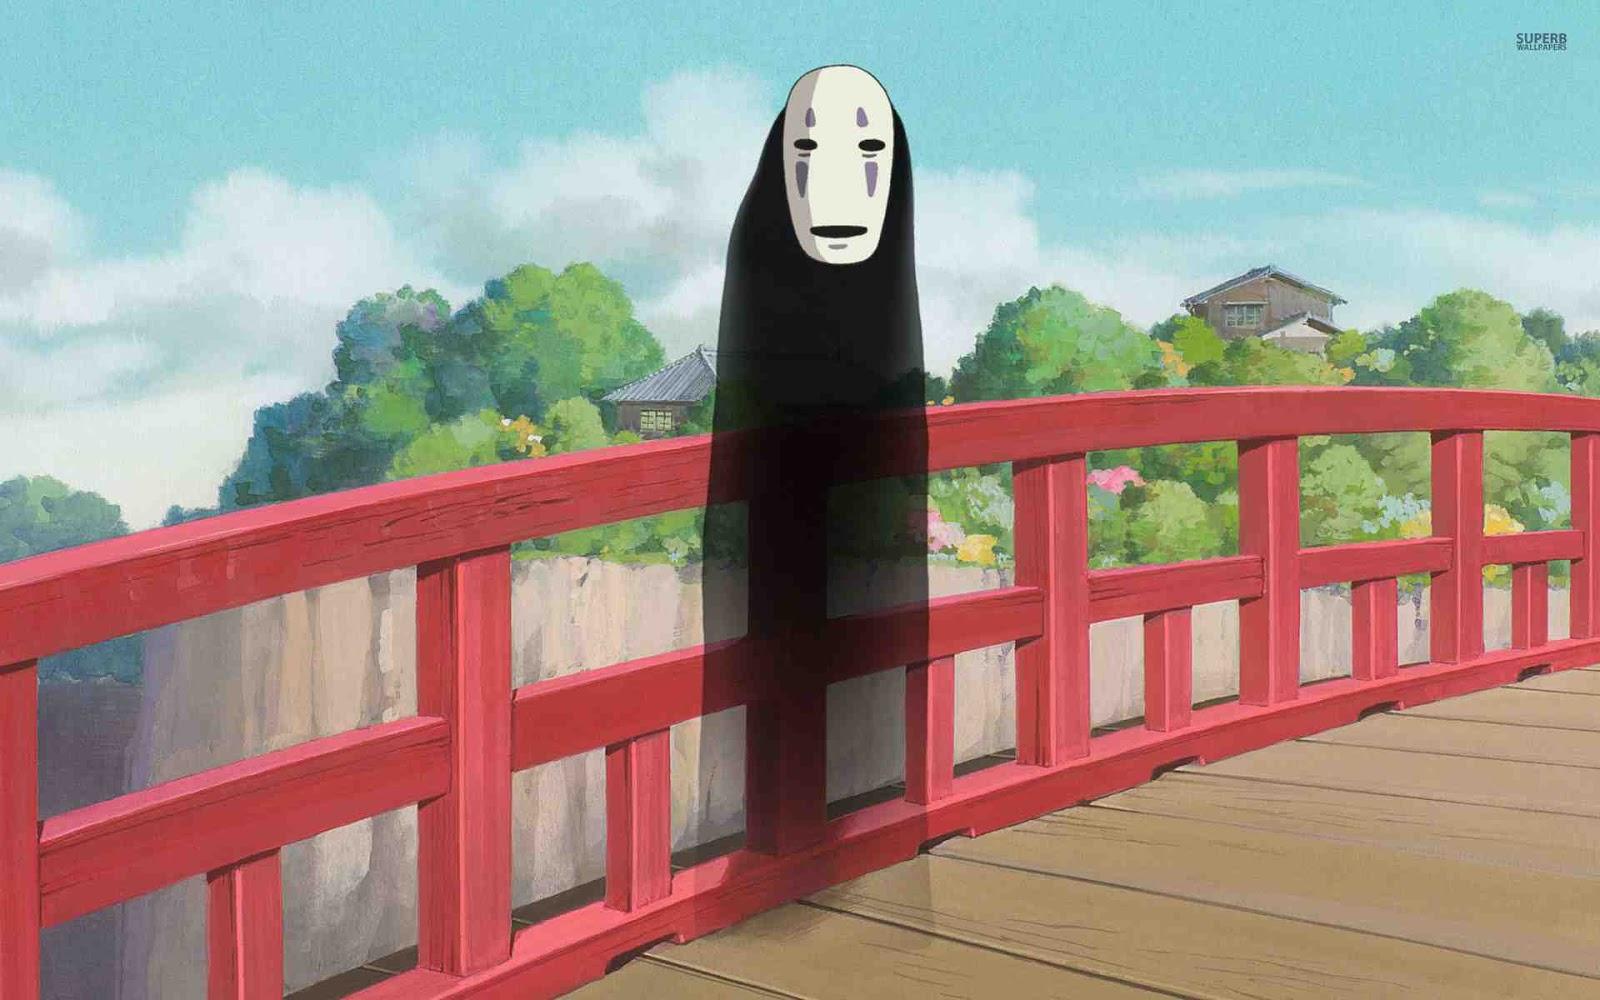 halloween, Halloween movies, hayao miyazaki, spirited away